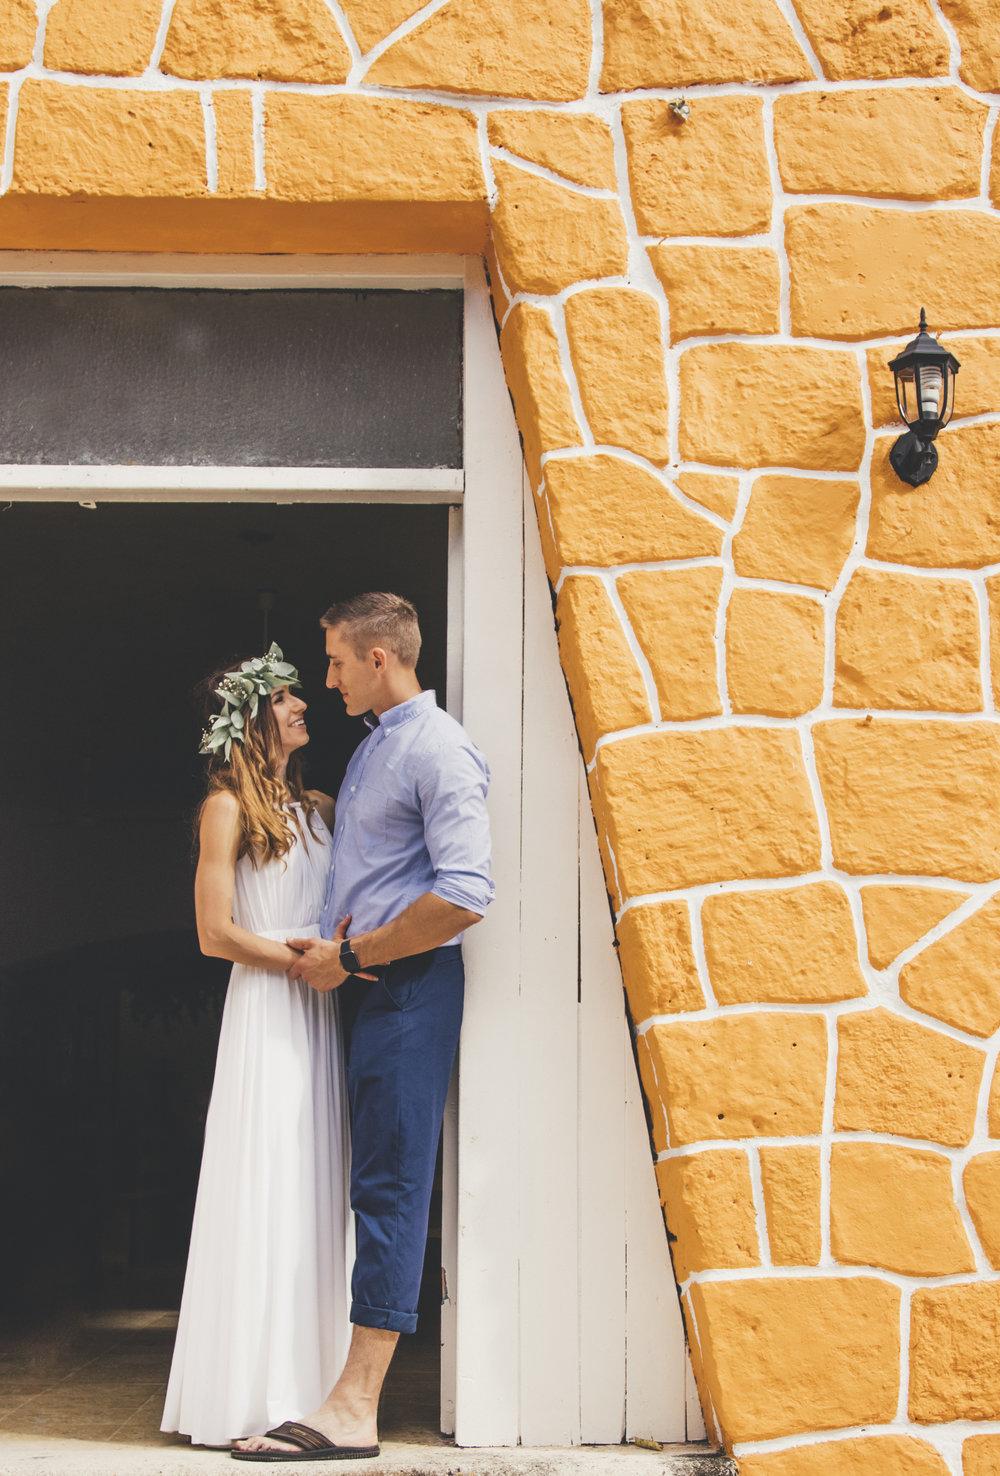 albrica_tierra_wedding_photographer_amyandted_390.jpg